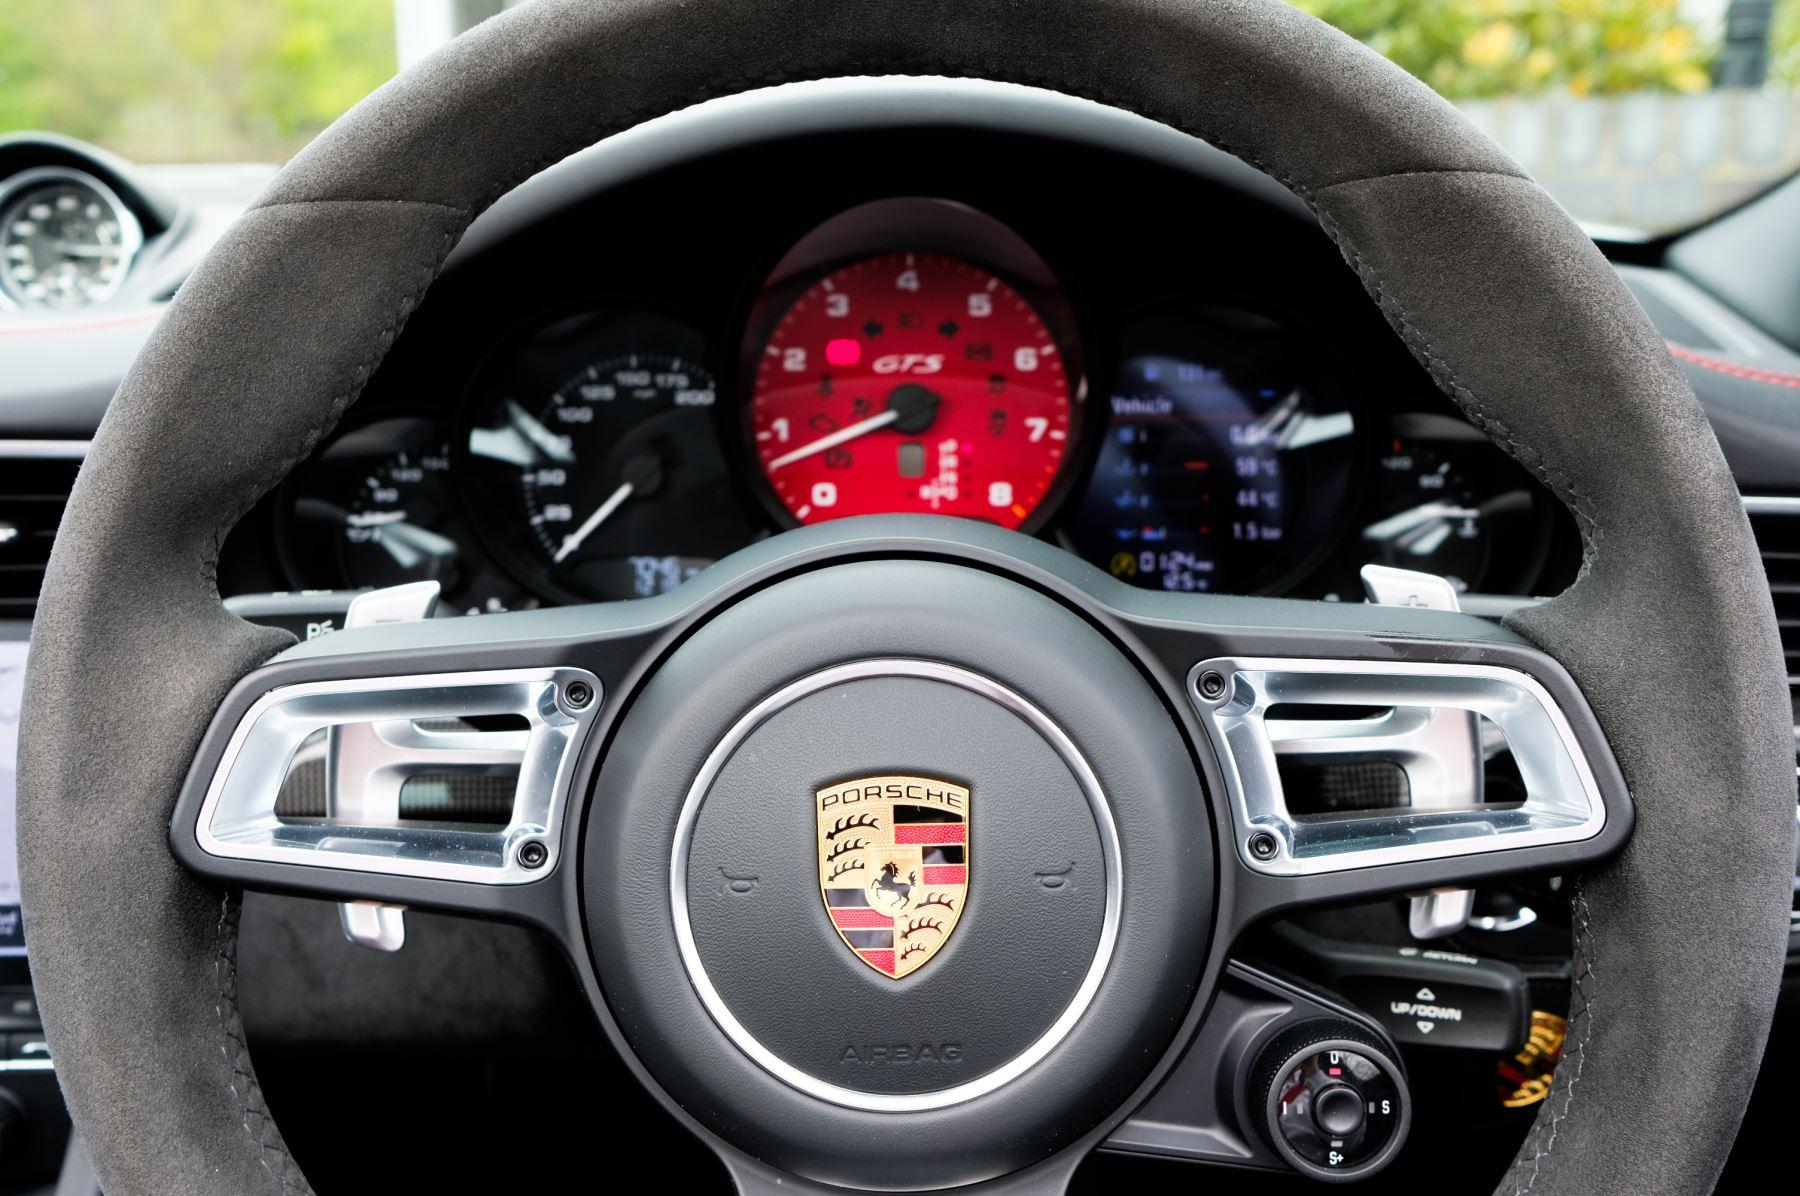 Porsche 911 TARGA 4 GTS - PDK - SPORT DESIGN PACKAGE - GTS INTERIOR PACKAGE image 24